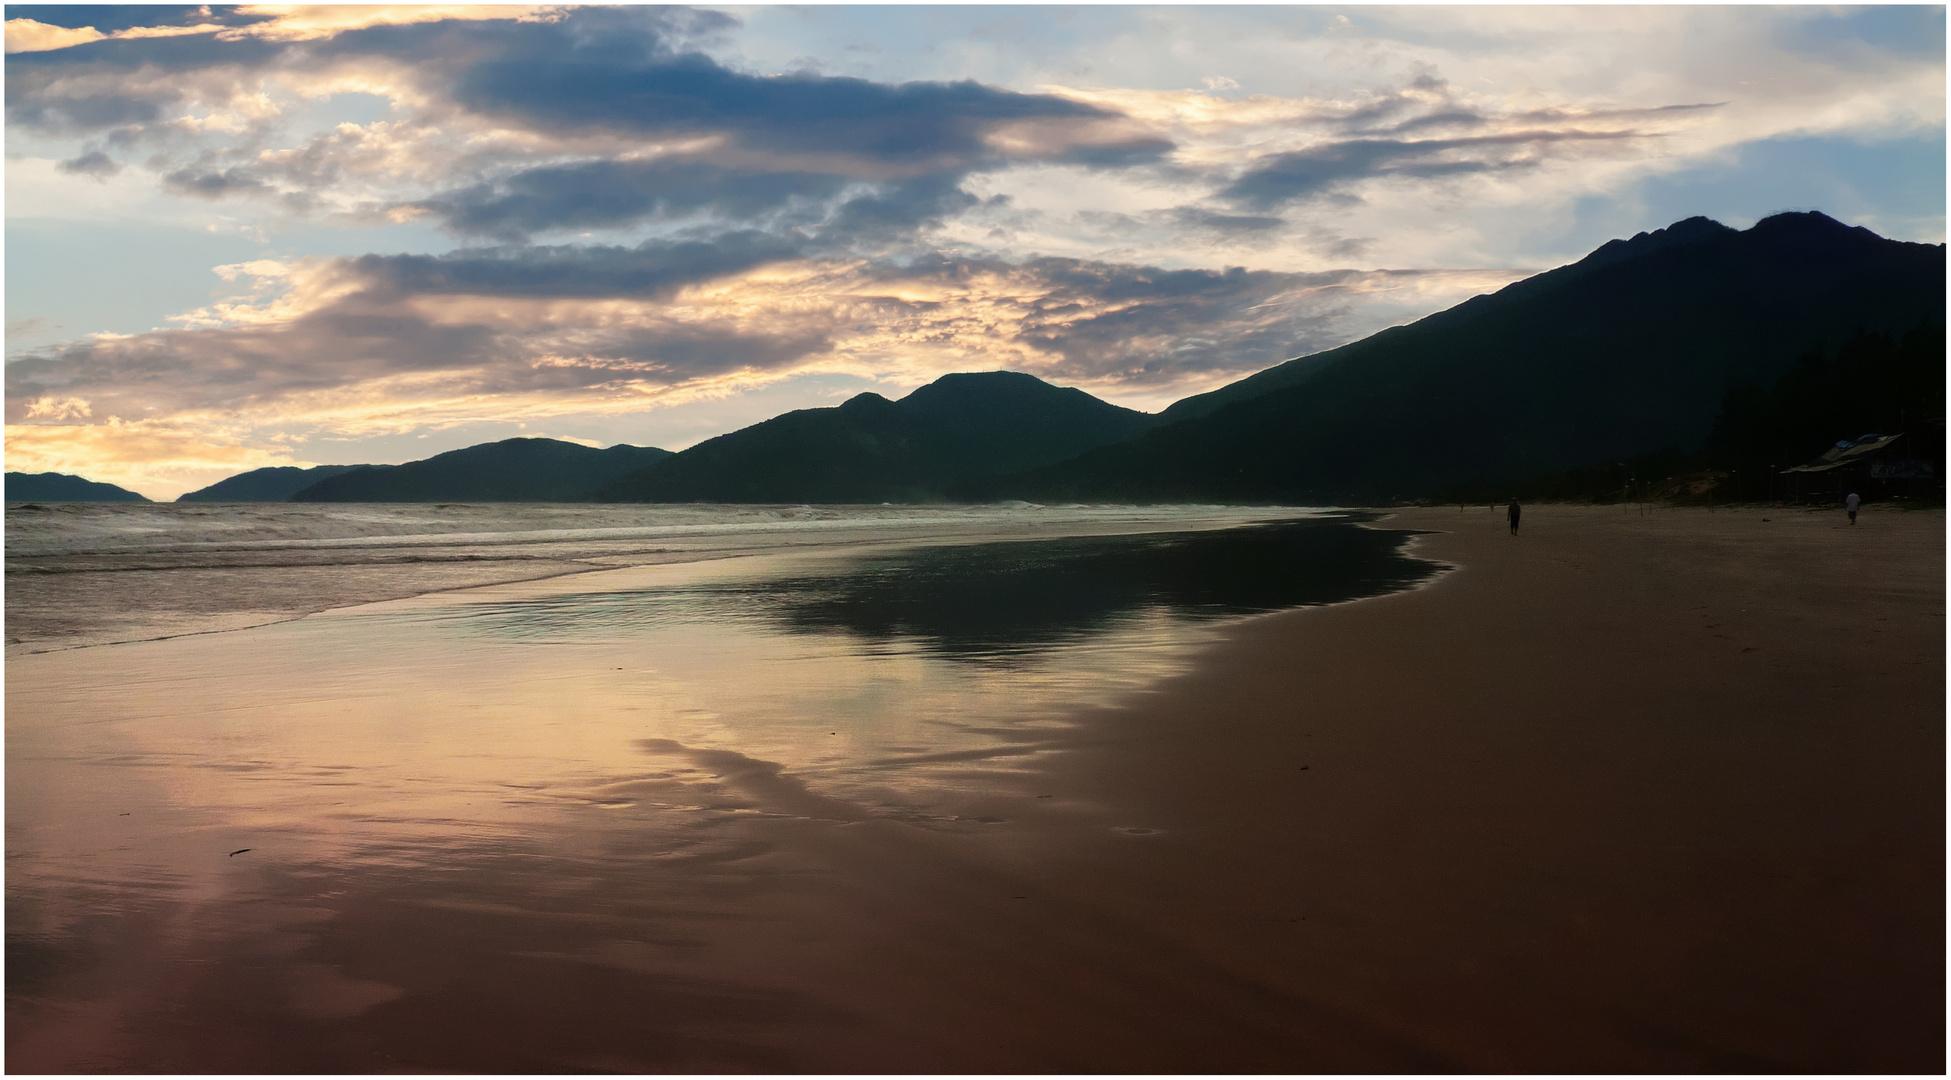 VIETNAM - La spiaggia di Lang Co